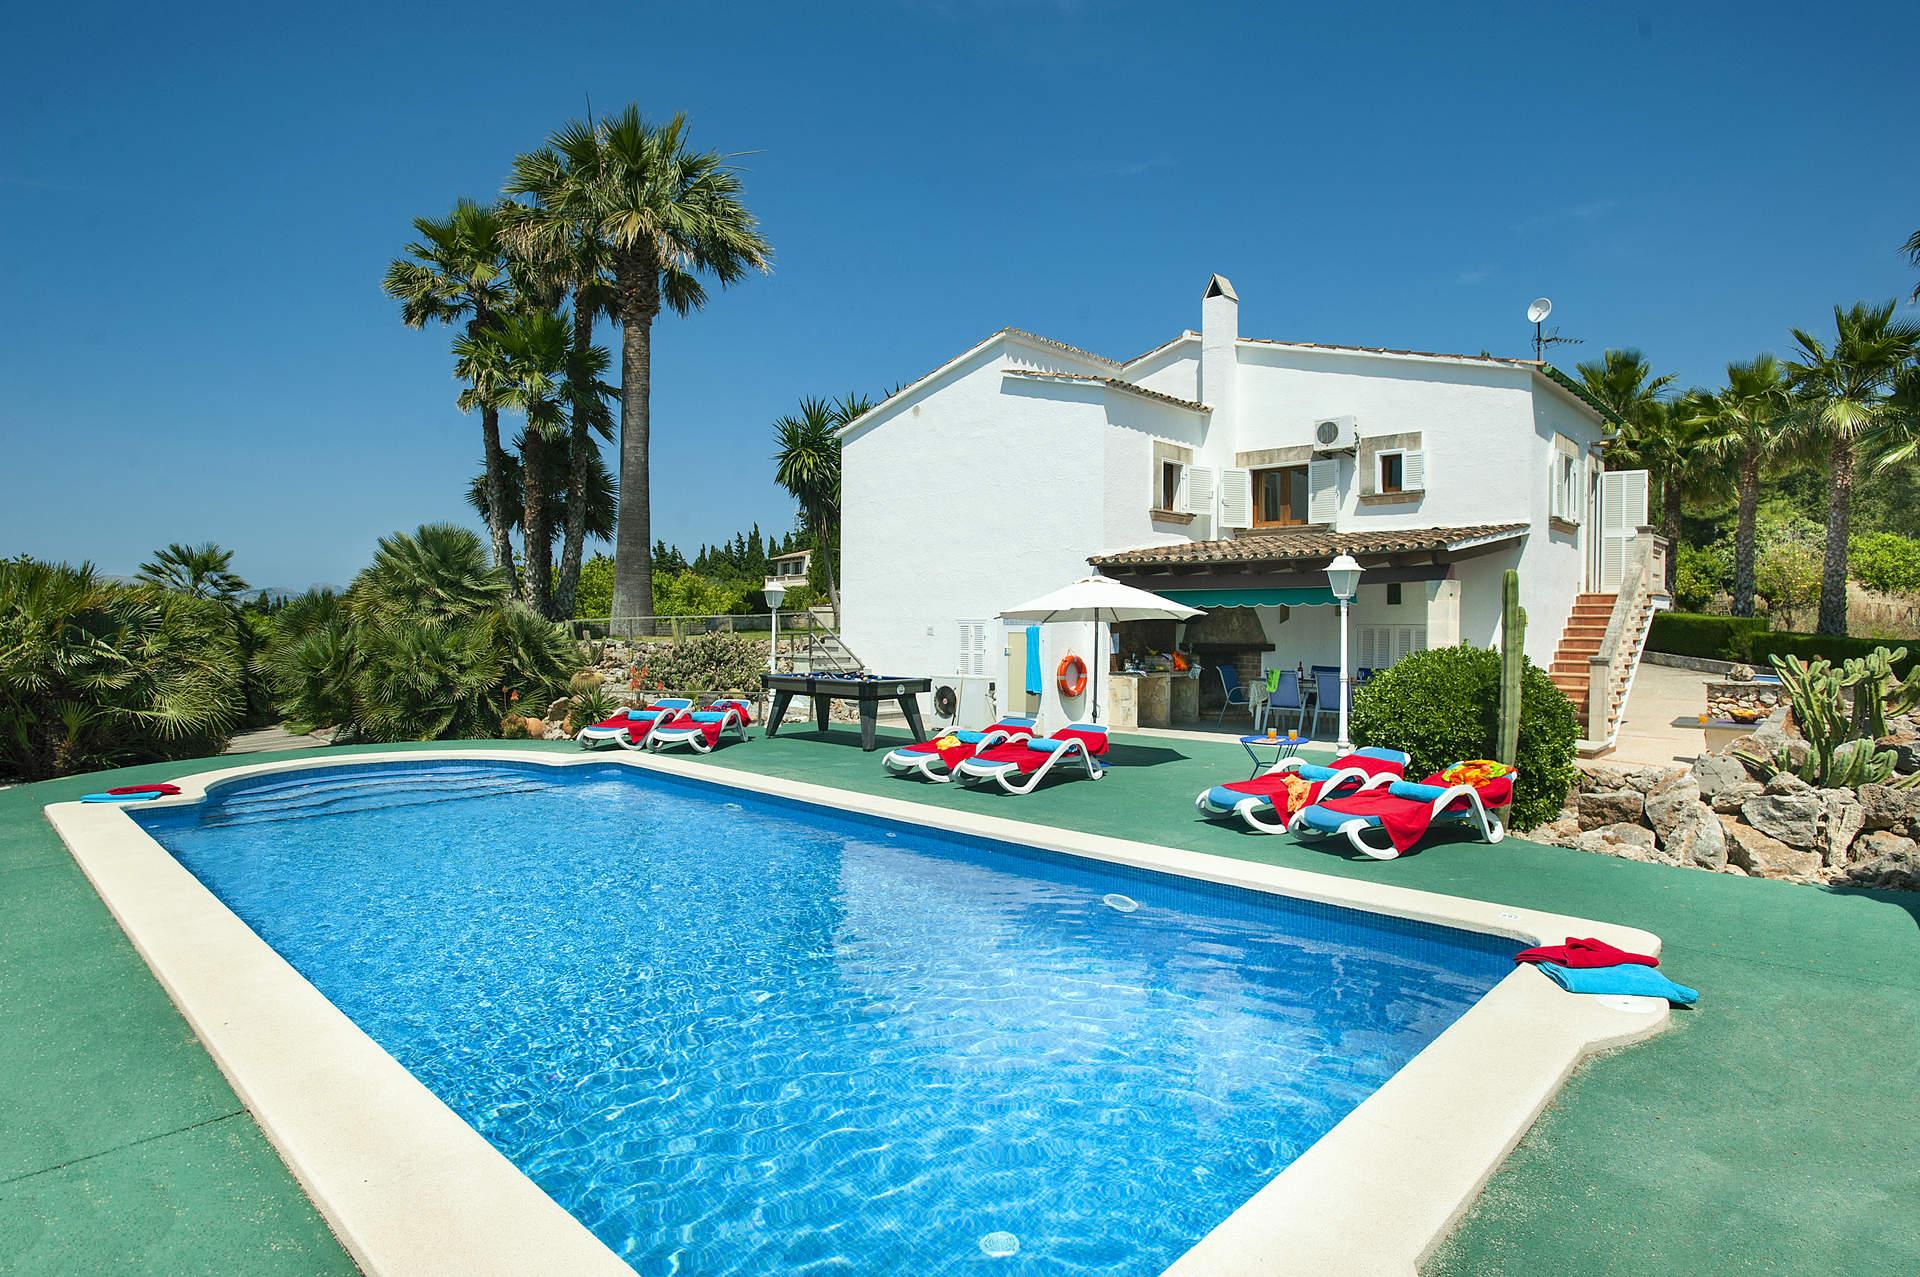 Villa Conxa Bisanyes, Pollensa, Majorca, Spain